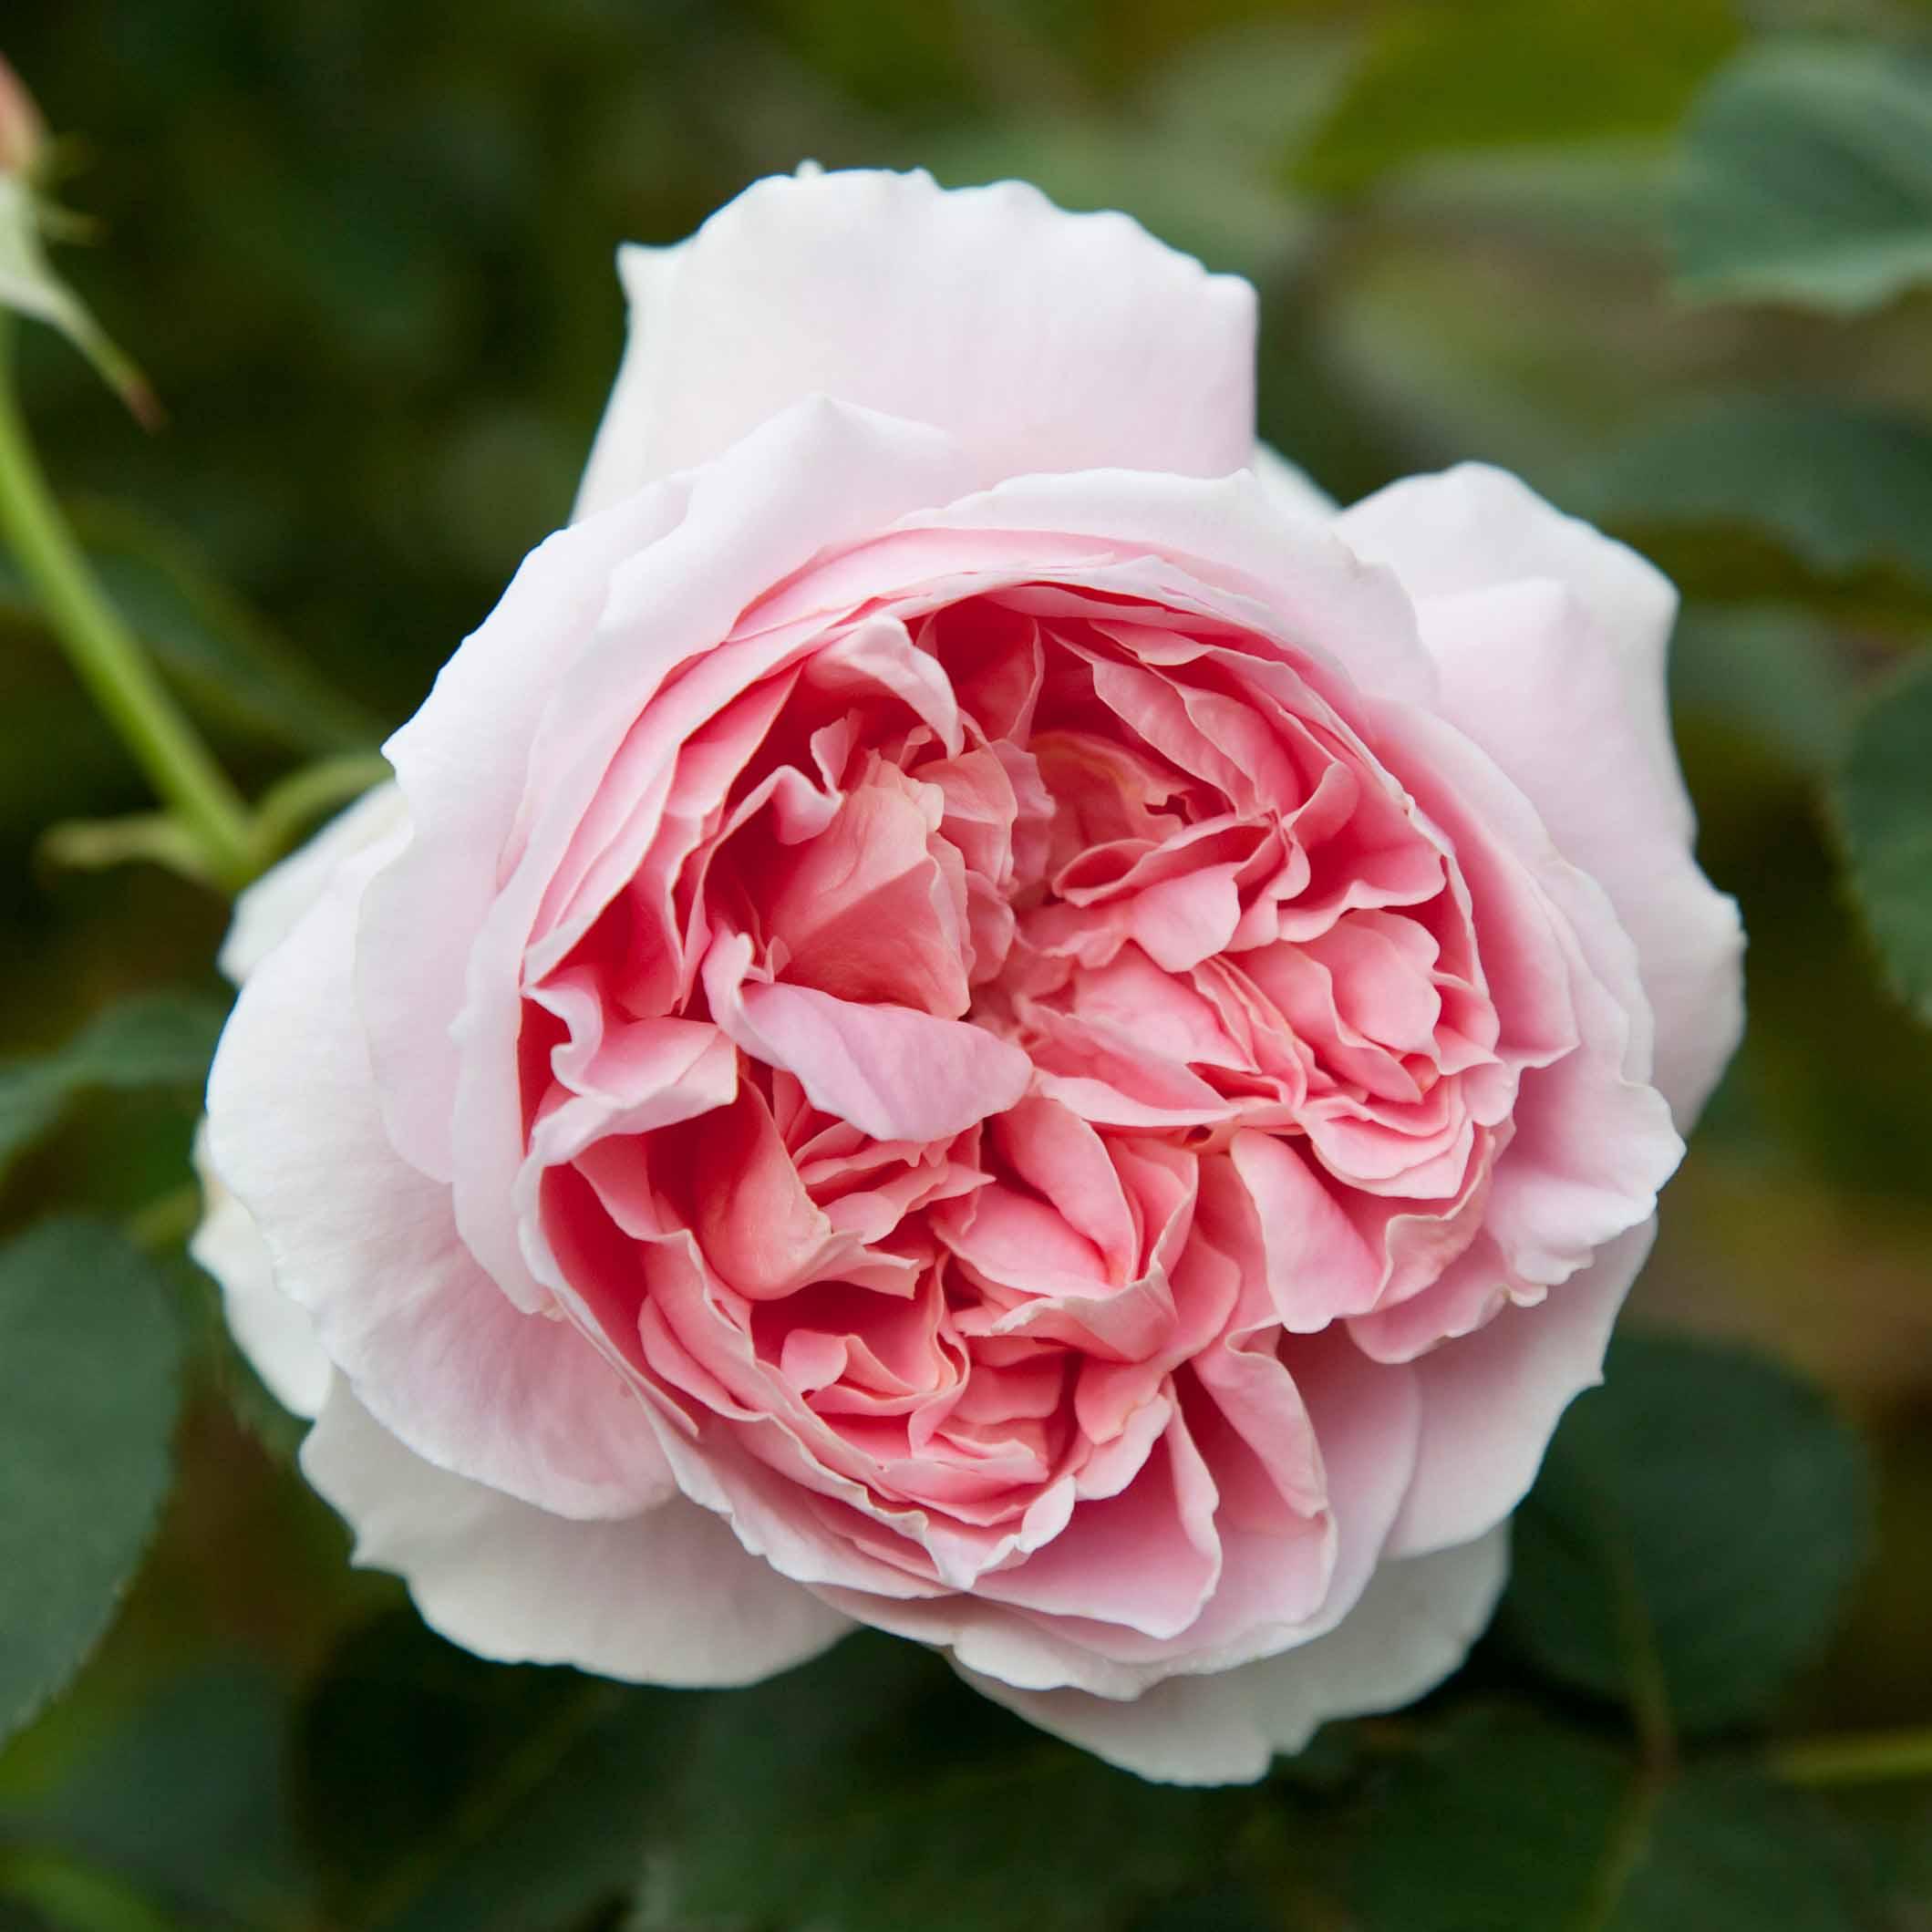 roses-reduced-8.jpg